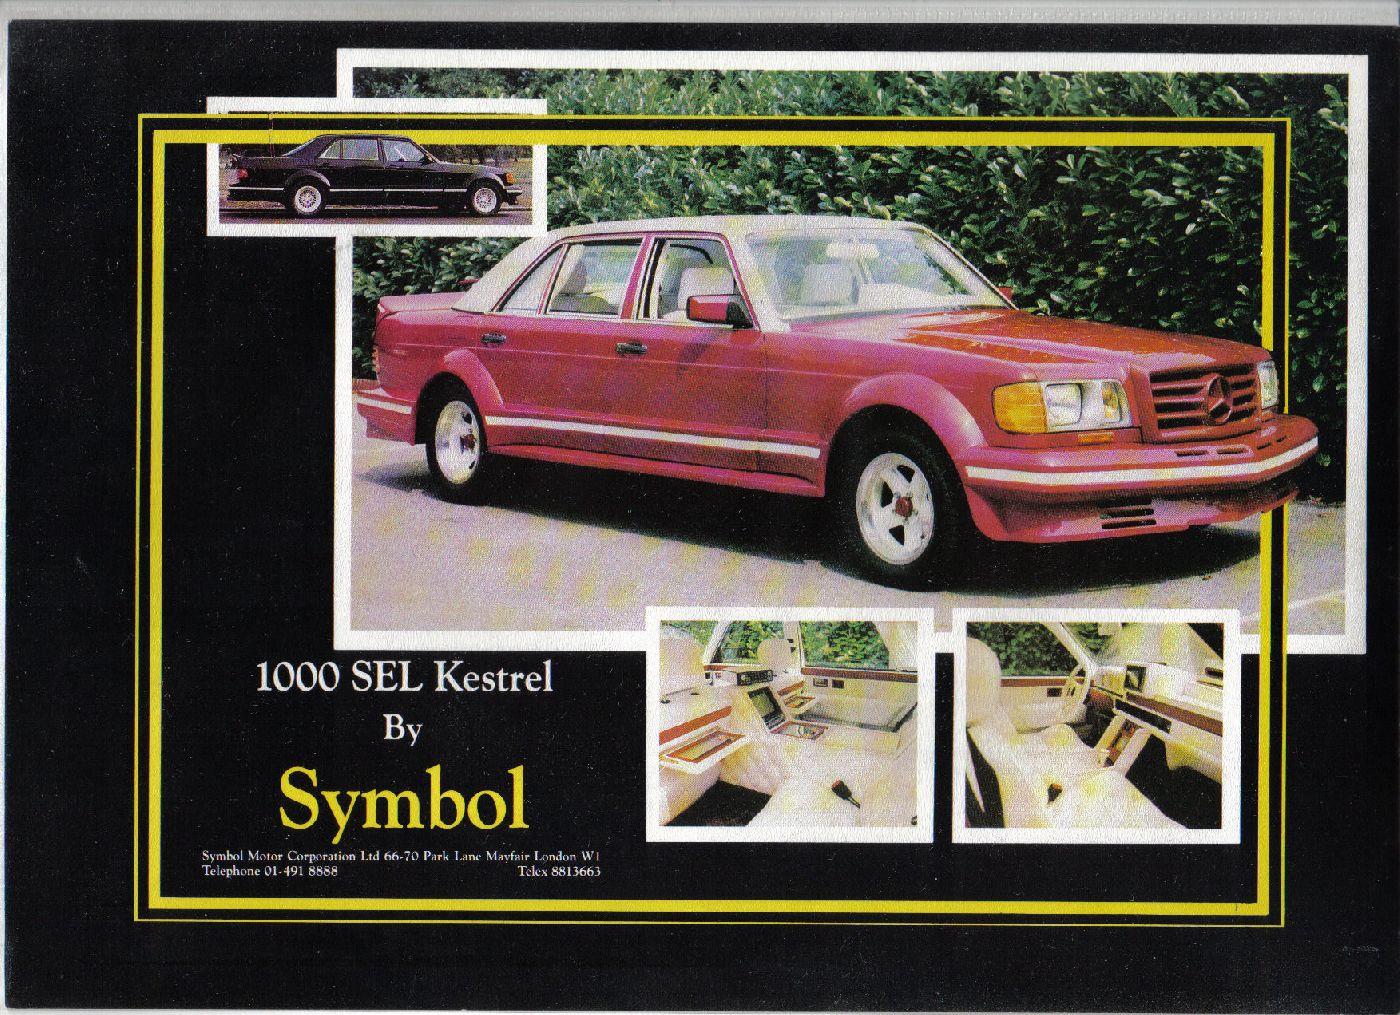 (W126): Conversão feita pela Symbol® - 1000SEL 8db56910